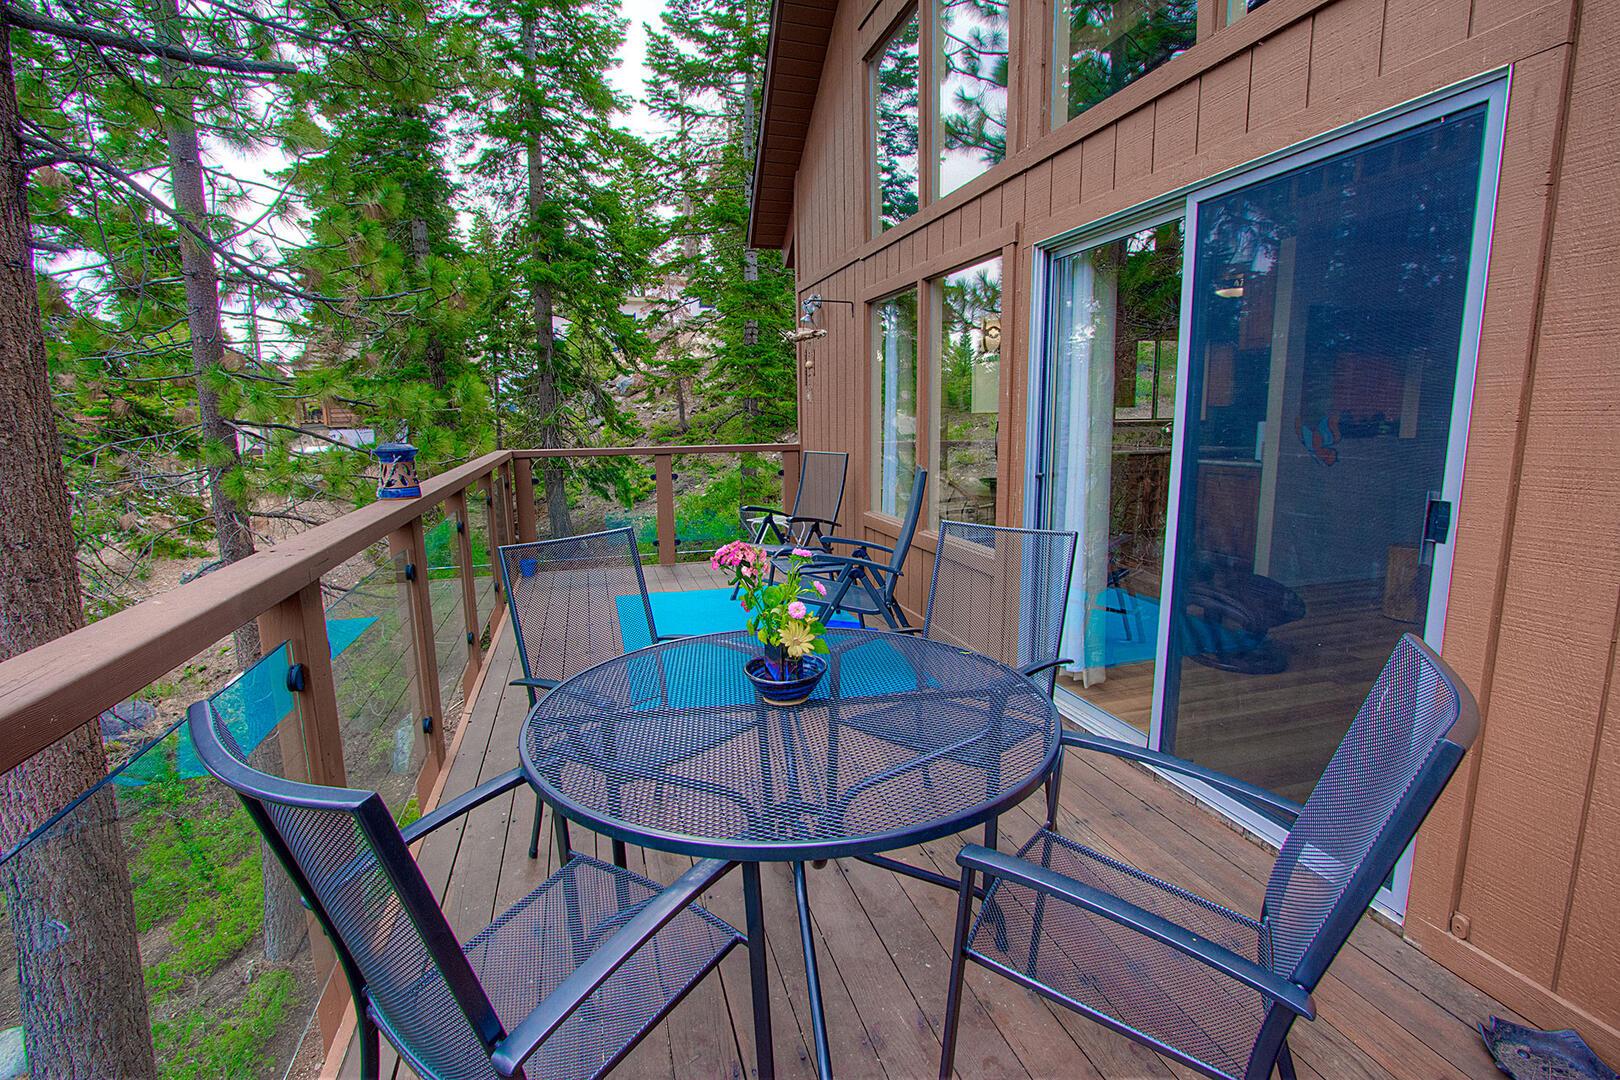 wsh1027 Living room